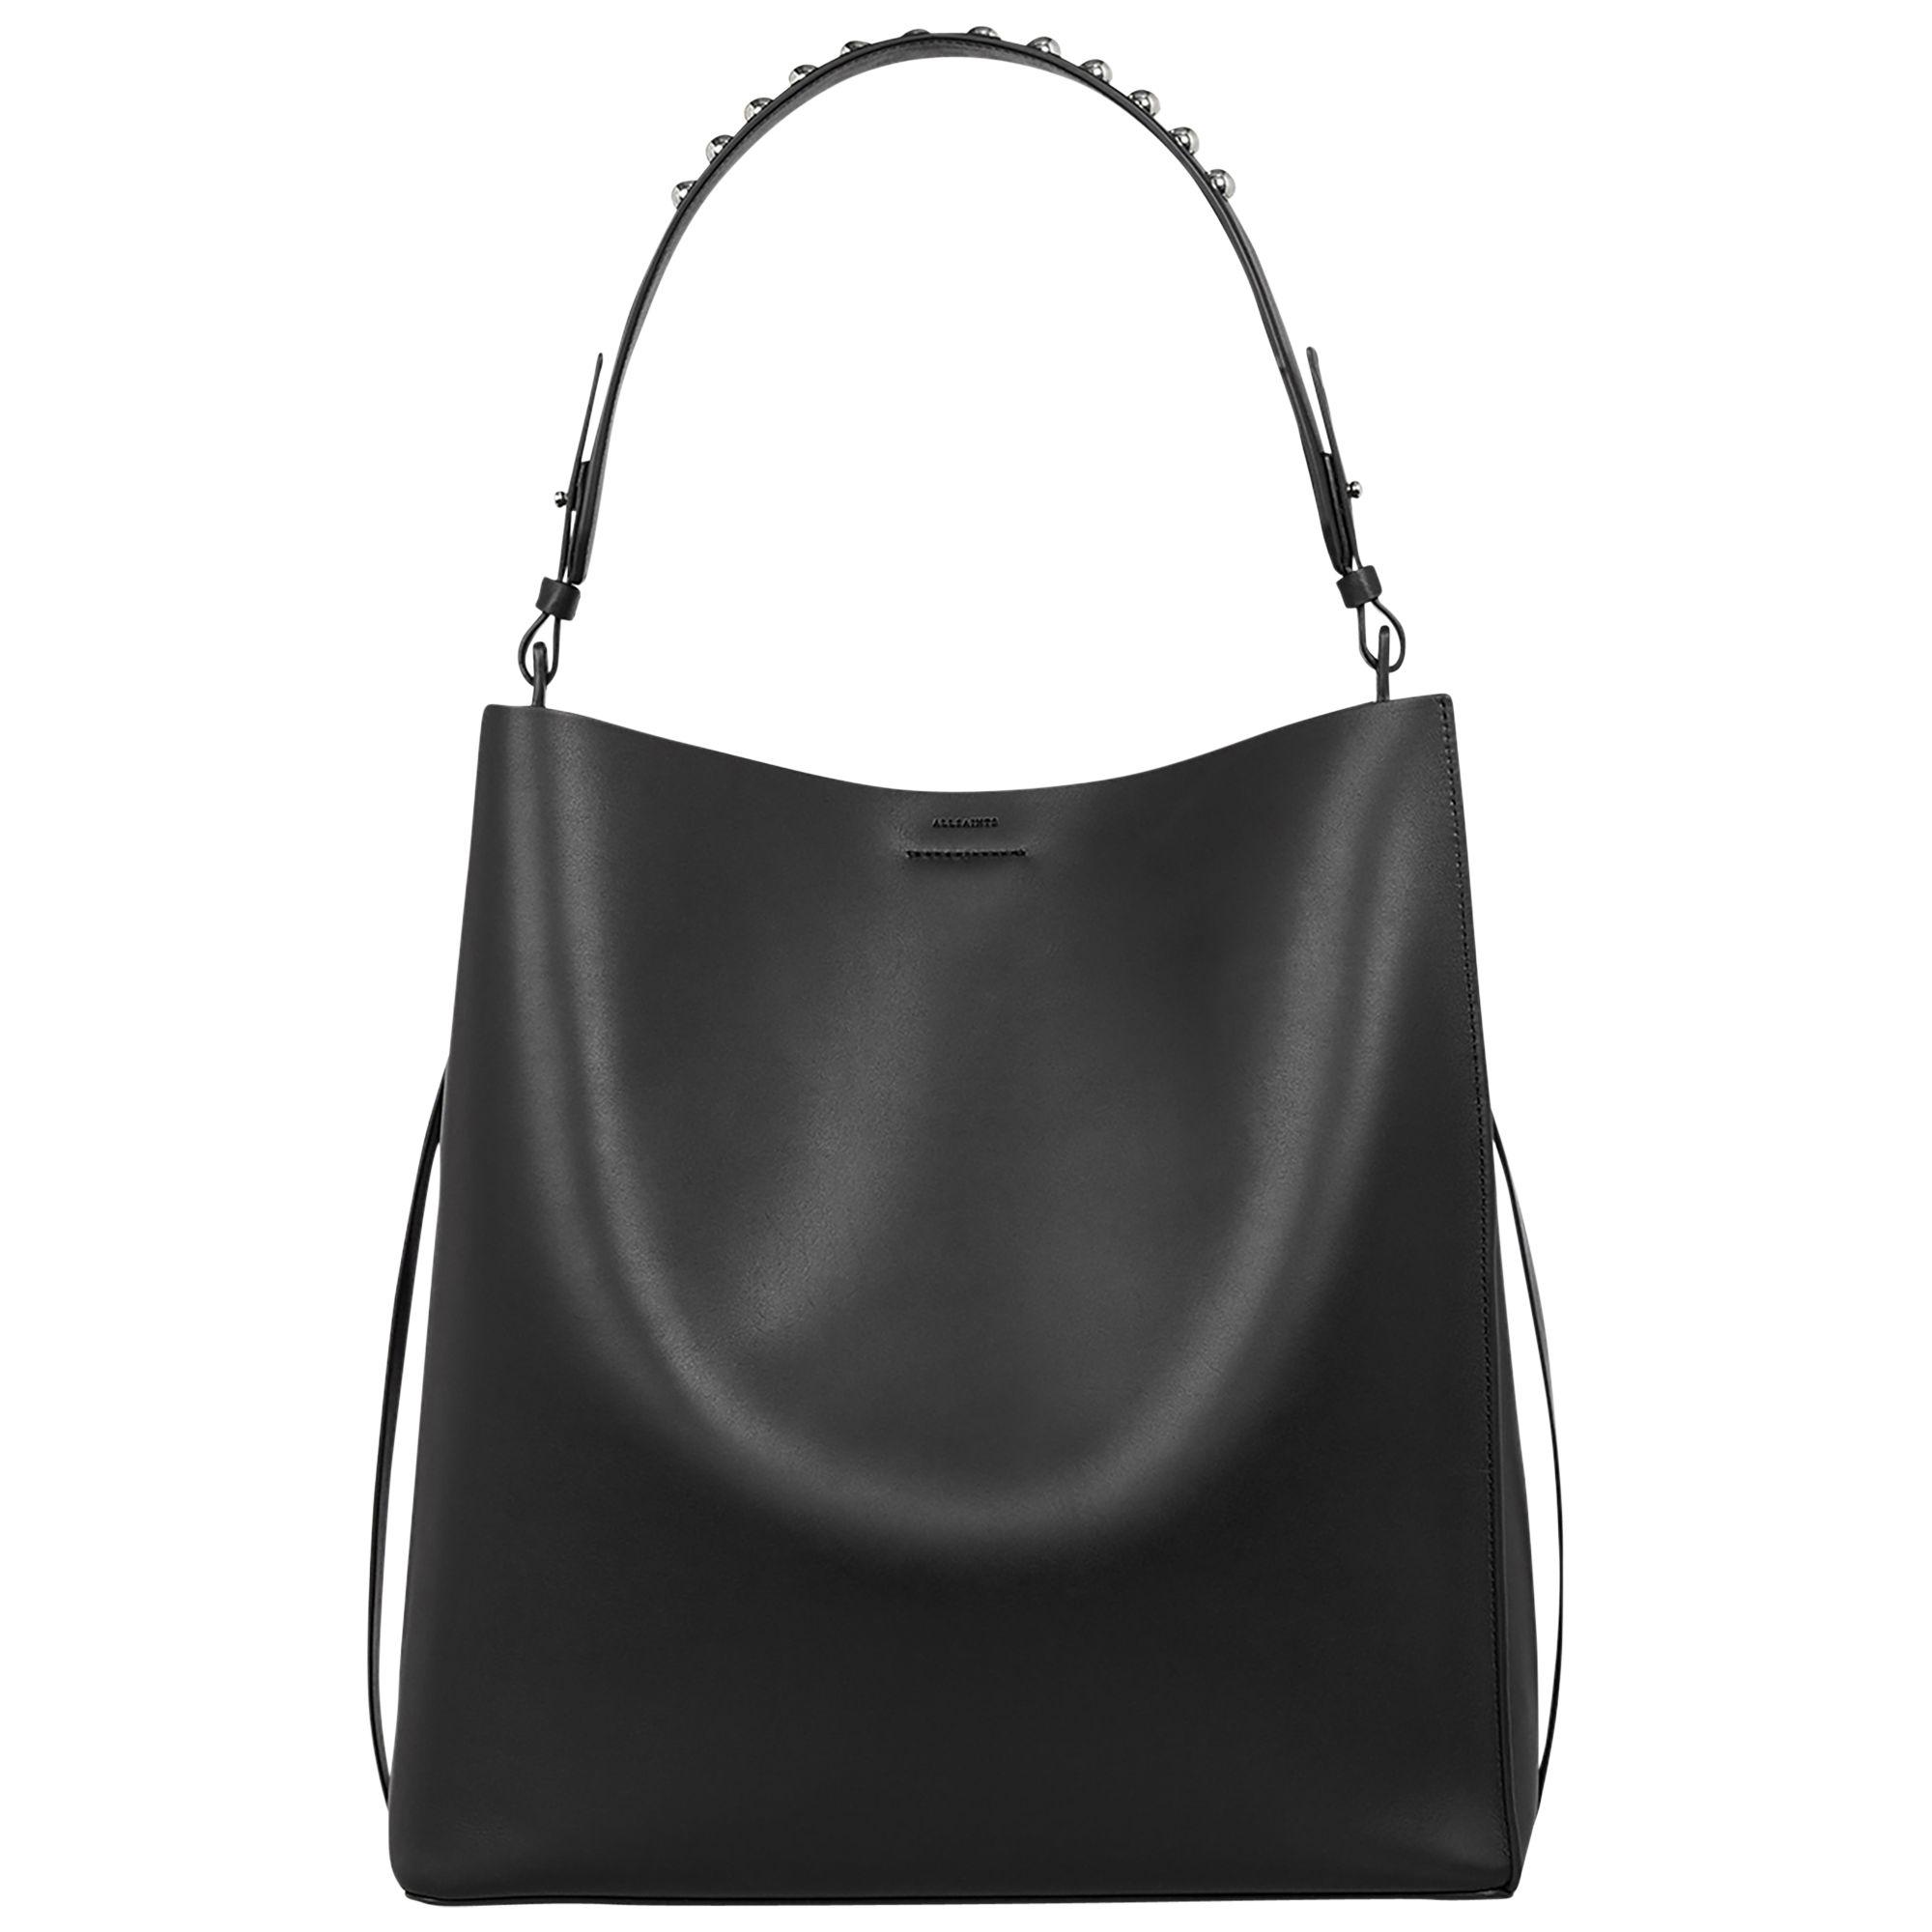 398fc46b2 AllSaints Suzi Leather North South Tote Bag at John Lewis & Partners